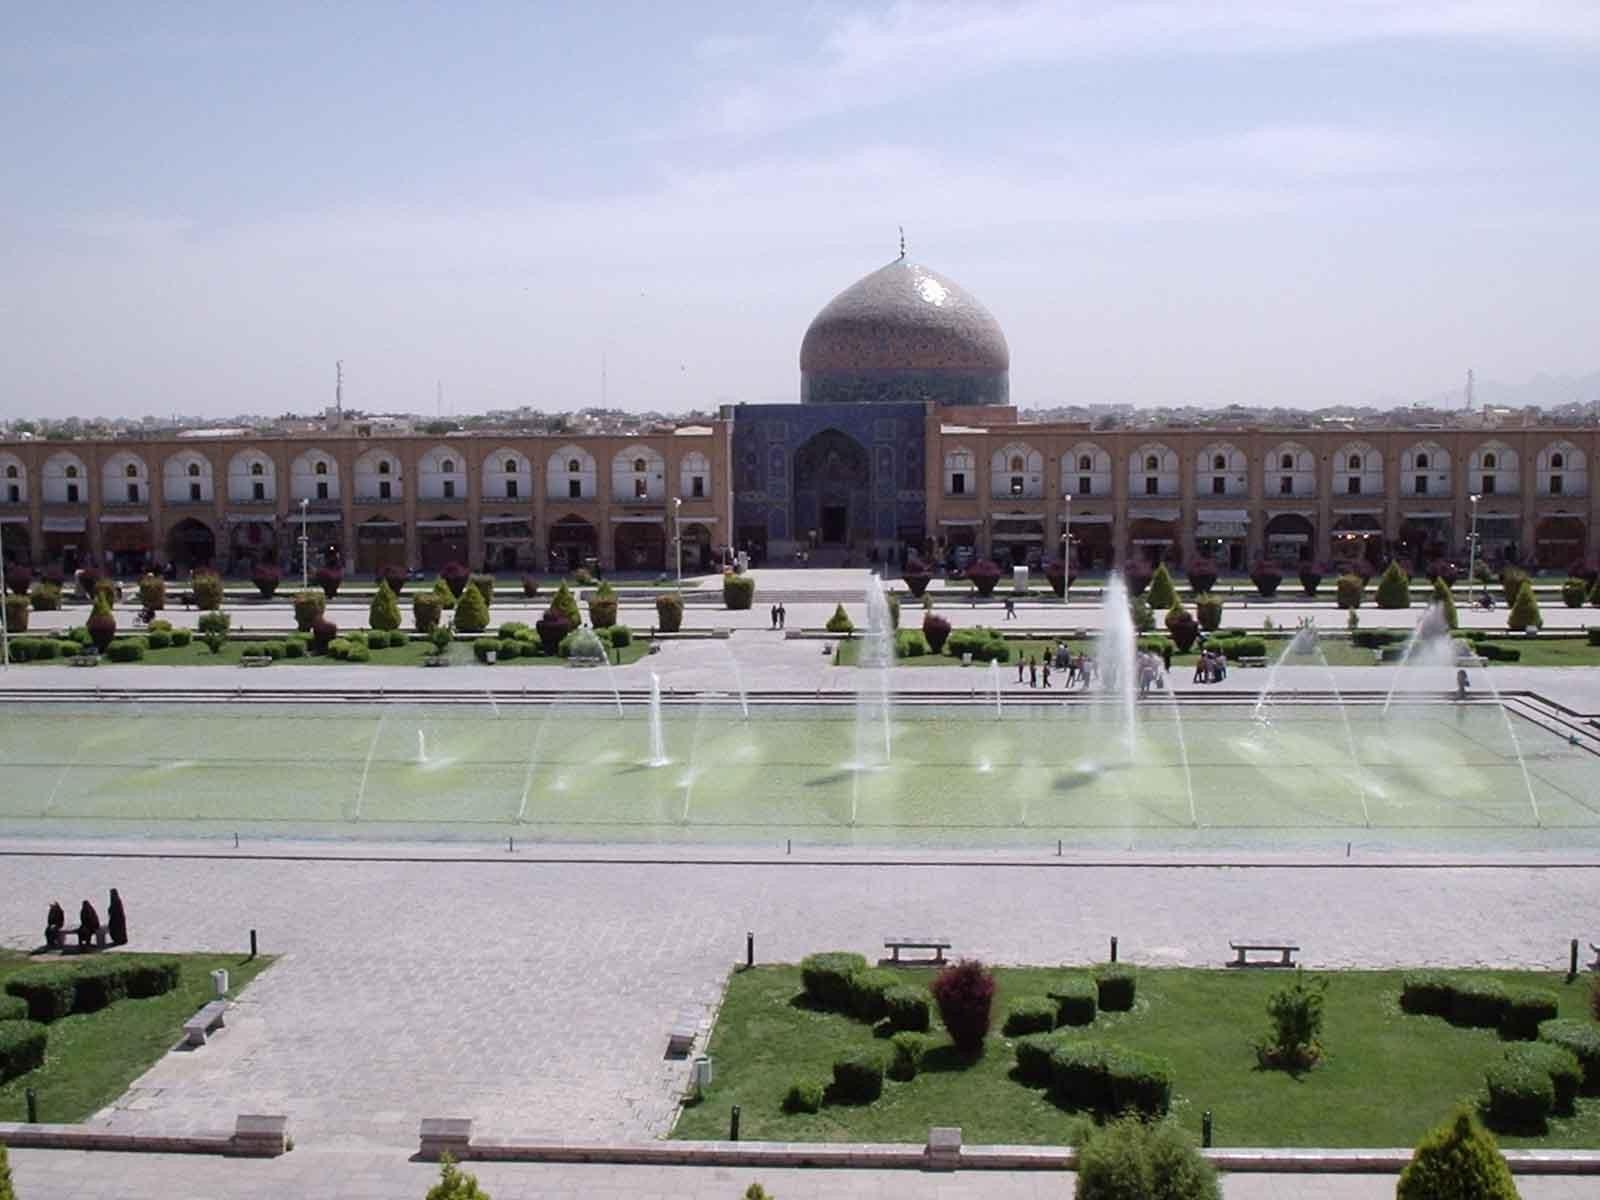 Naqshe Jahan Square (3).jpg